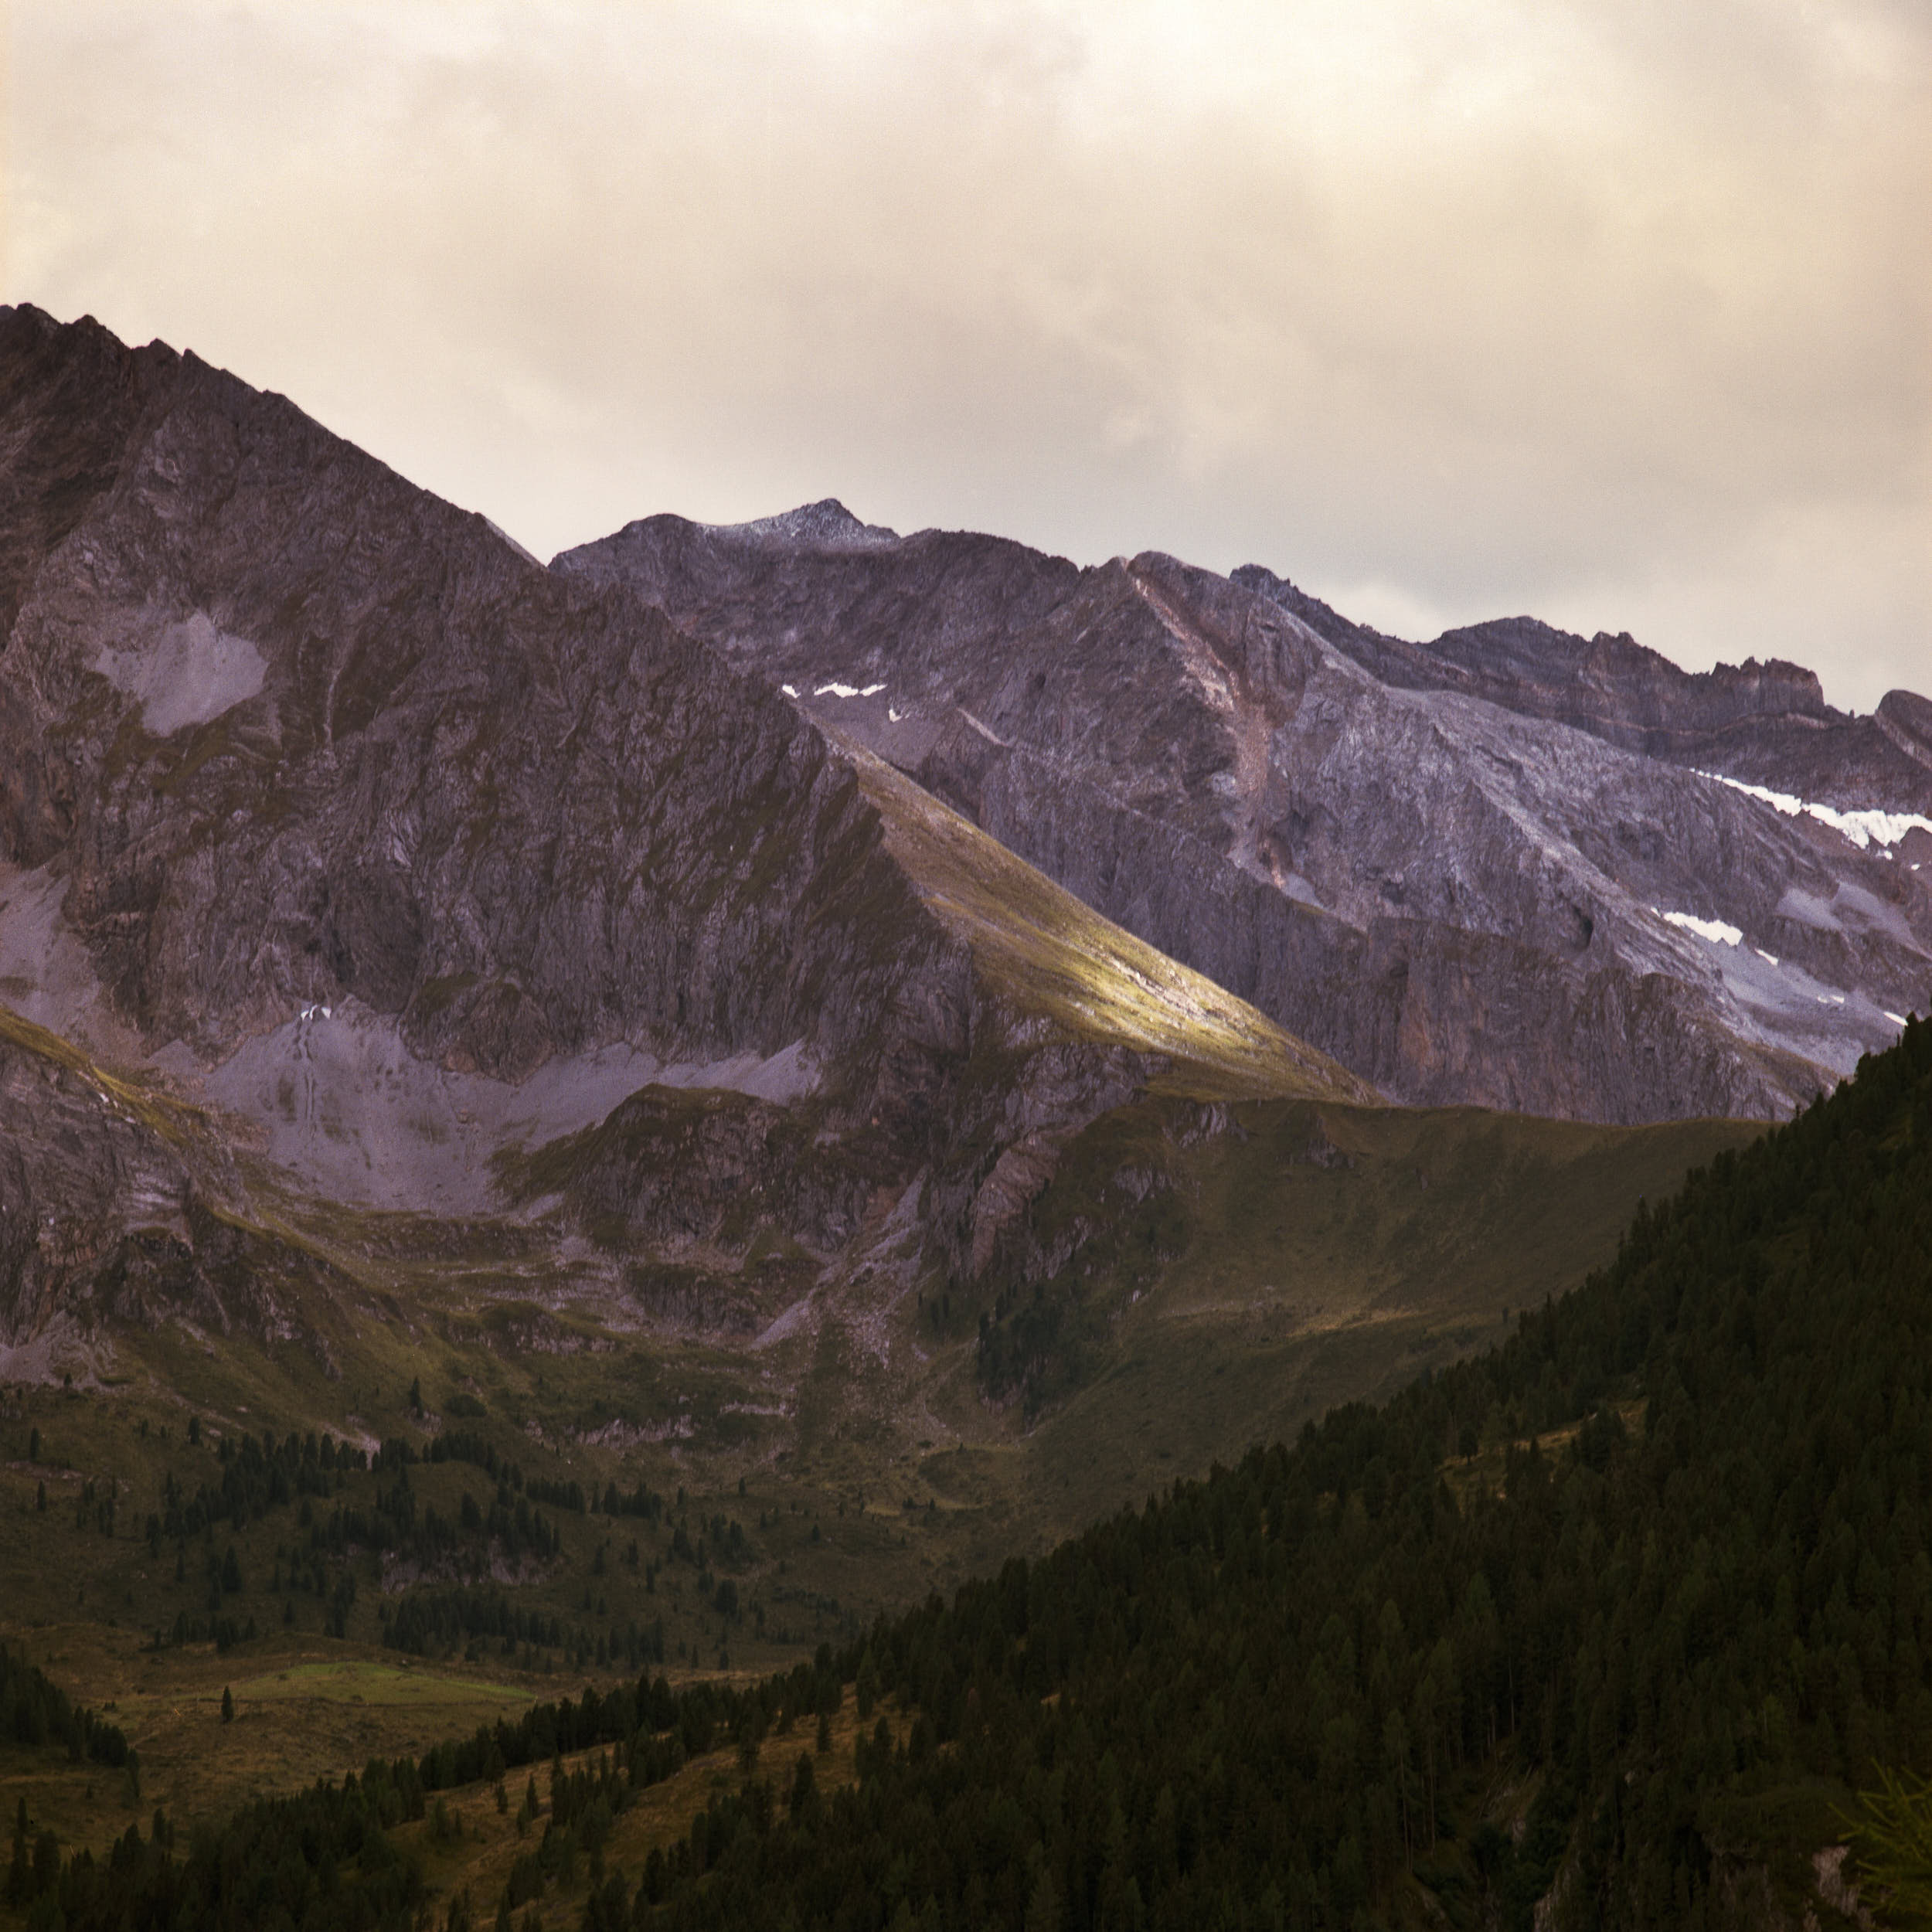 Film landscape photography: beautiful alpine peaks with spots of sunlight.